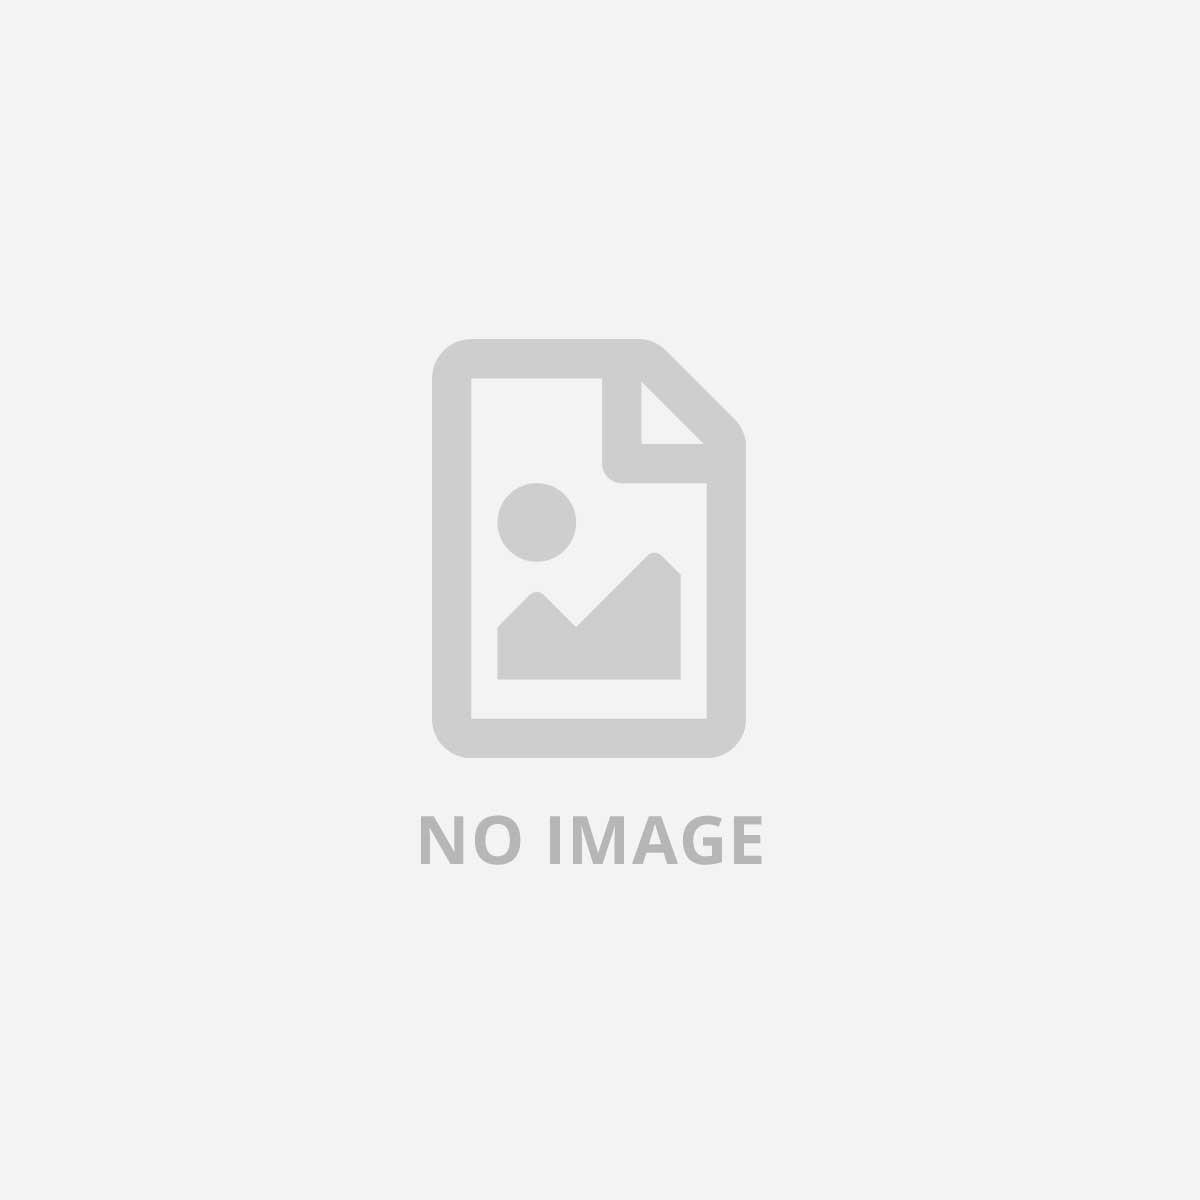 TESABASIC 19X66M IN FLAWPACK